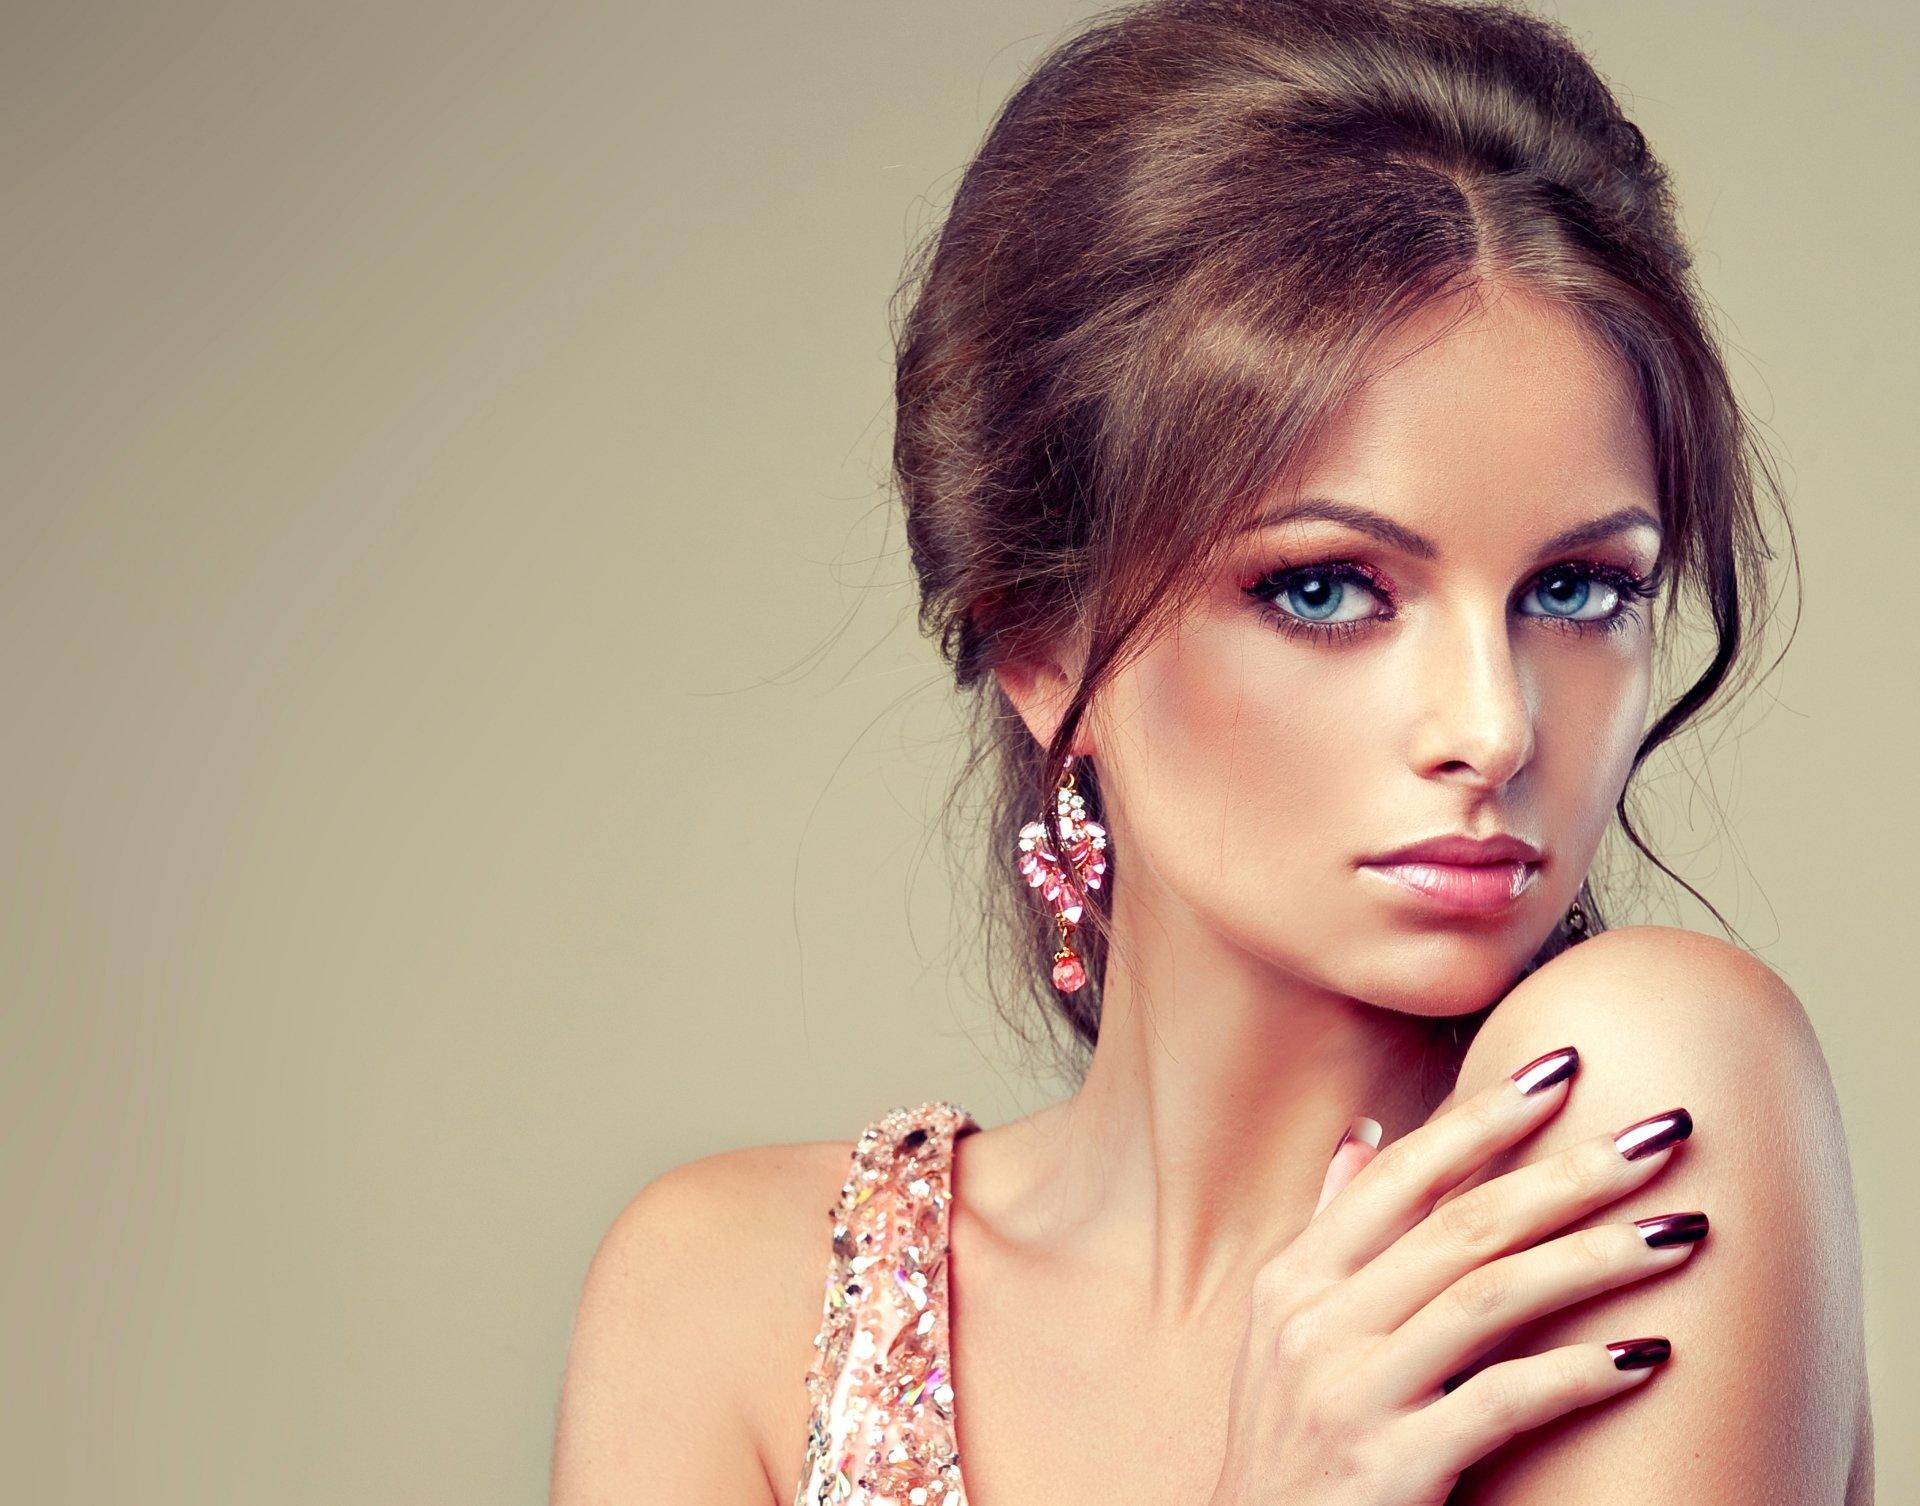 Fashion beauty model girl 5k retina ultra hd wallpaper background image 6400x5021 id - Beautiful model wallpaper ...